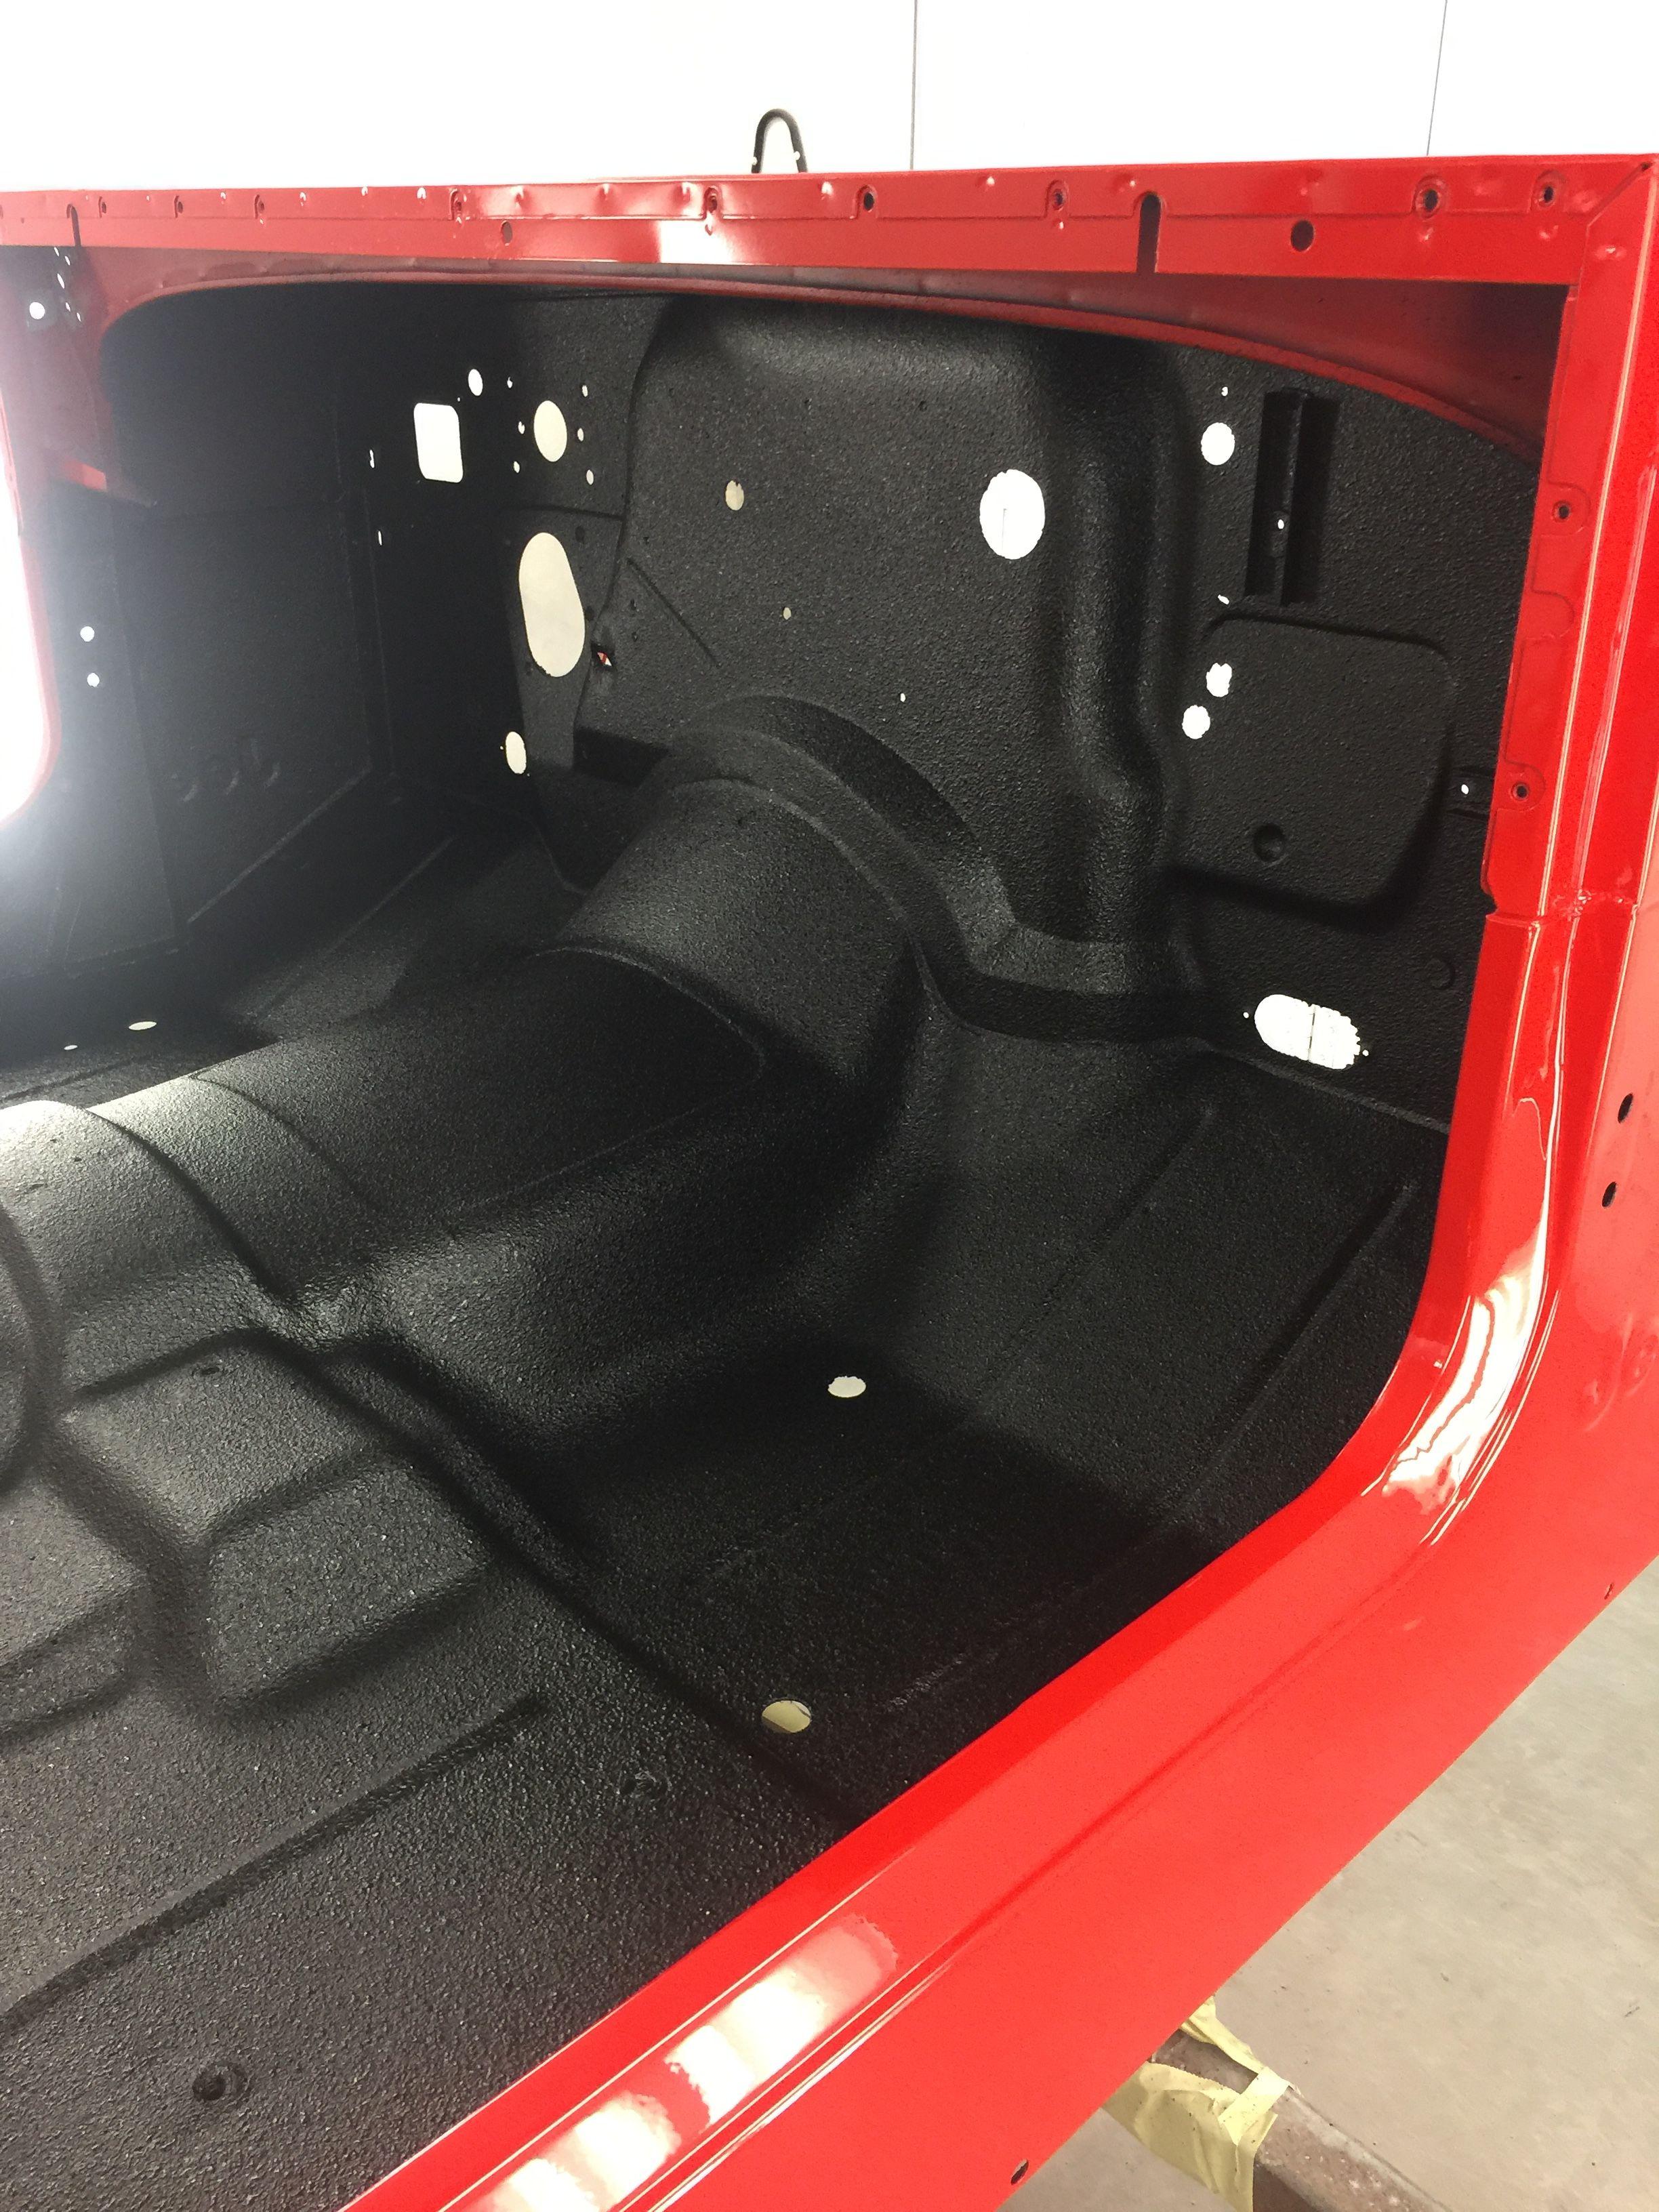 1979 Jeep Cj5 Body In Ferrari Red With Sprayed In Bed Liner Jeep Cj5 Jeep Cj Jeep